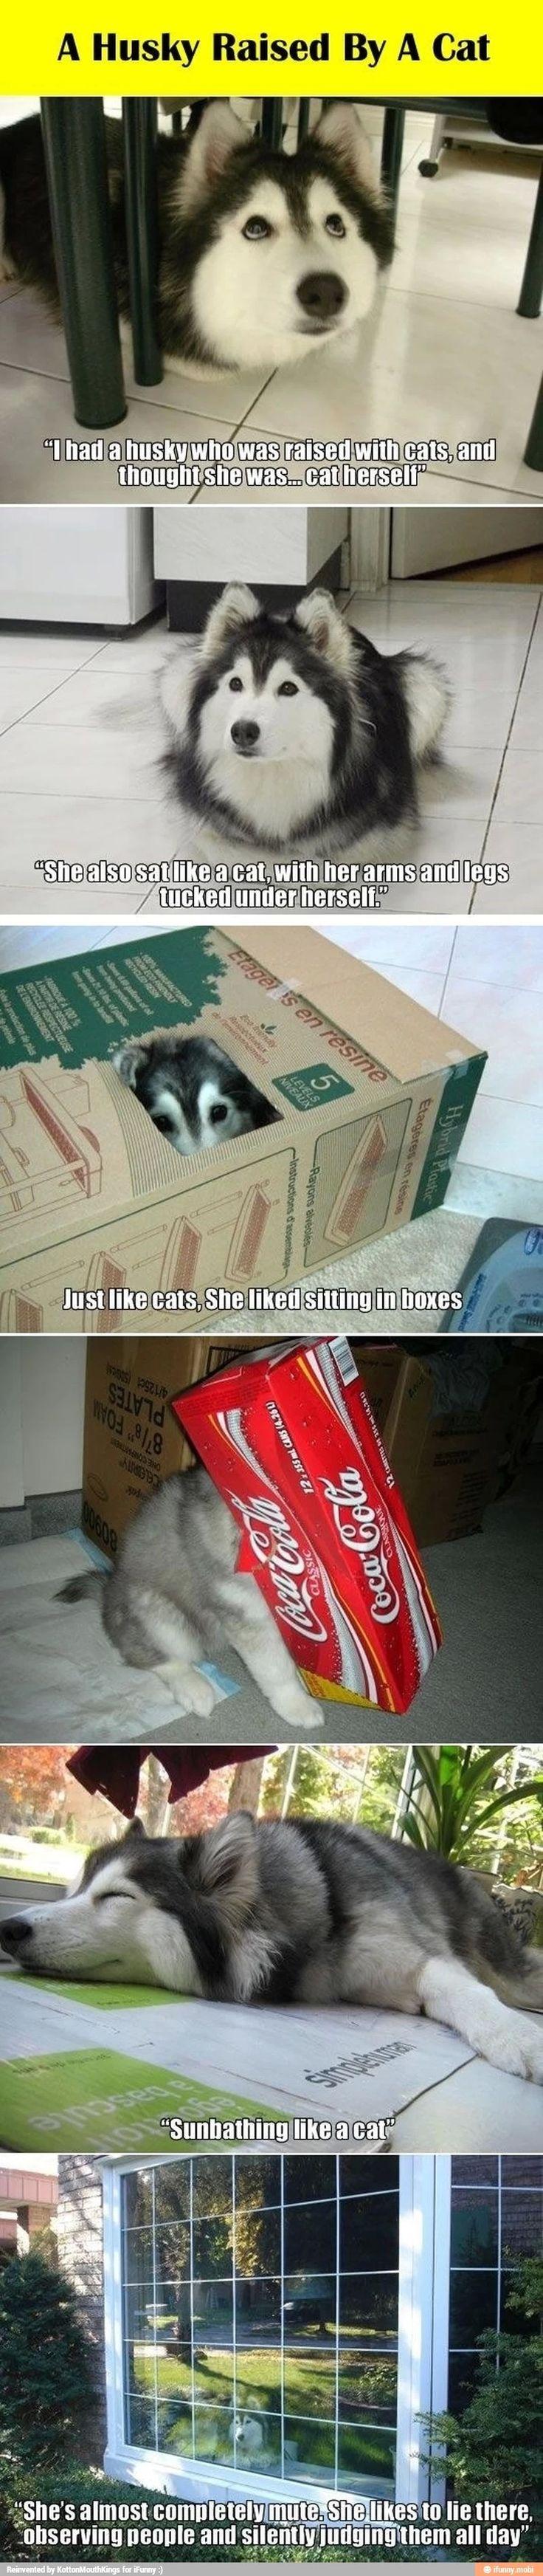 Husky thinks it's a cat!